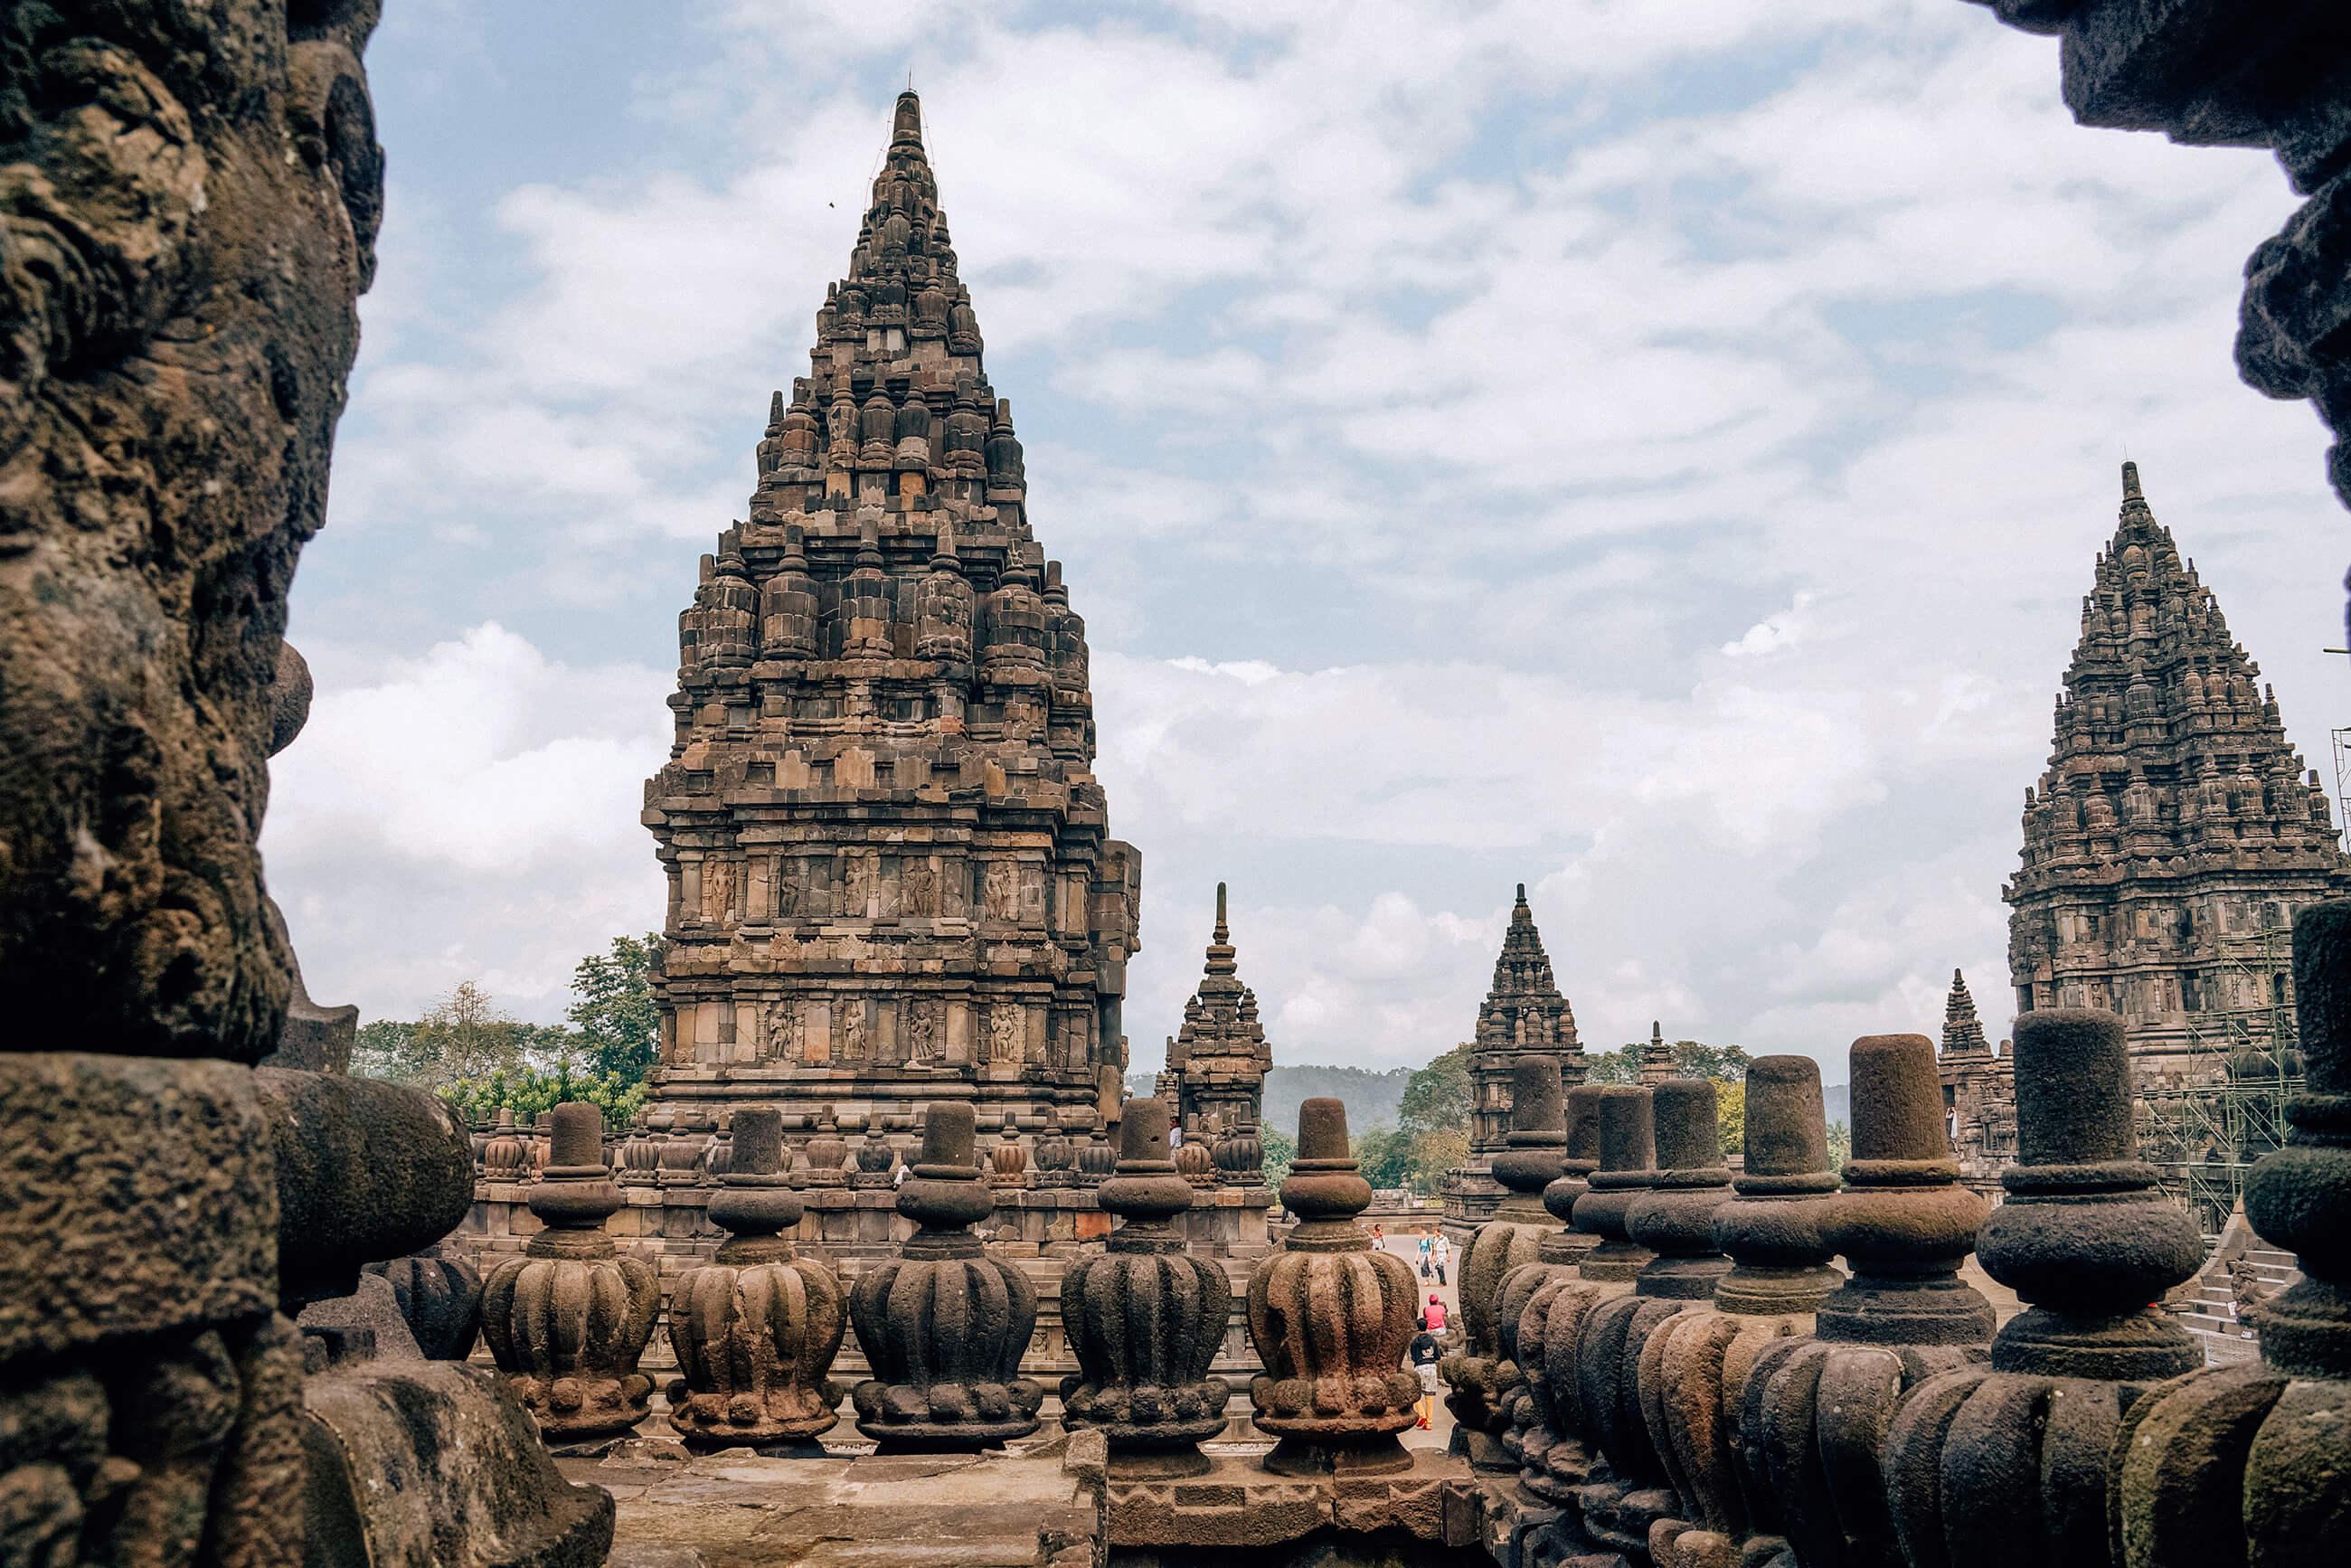 https://bubo.sk/uploads/galleries/7542/archiv_indonezia_java-jozef-zeliznak-st.-05-2014-49--48.jpg